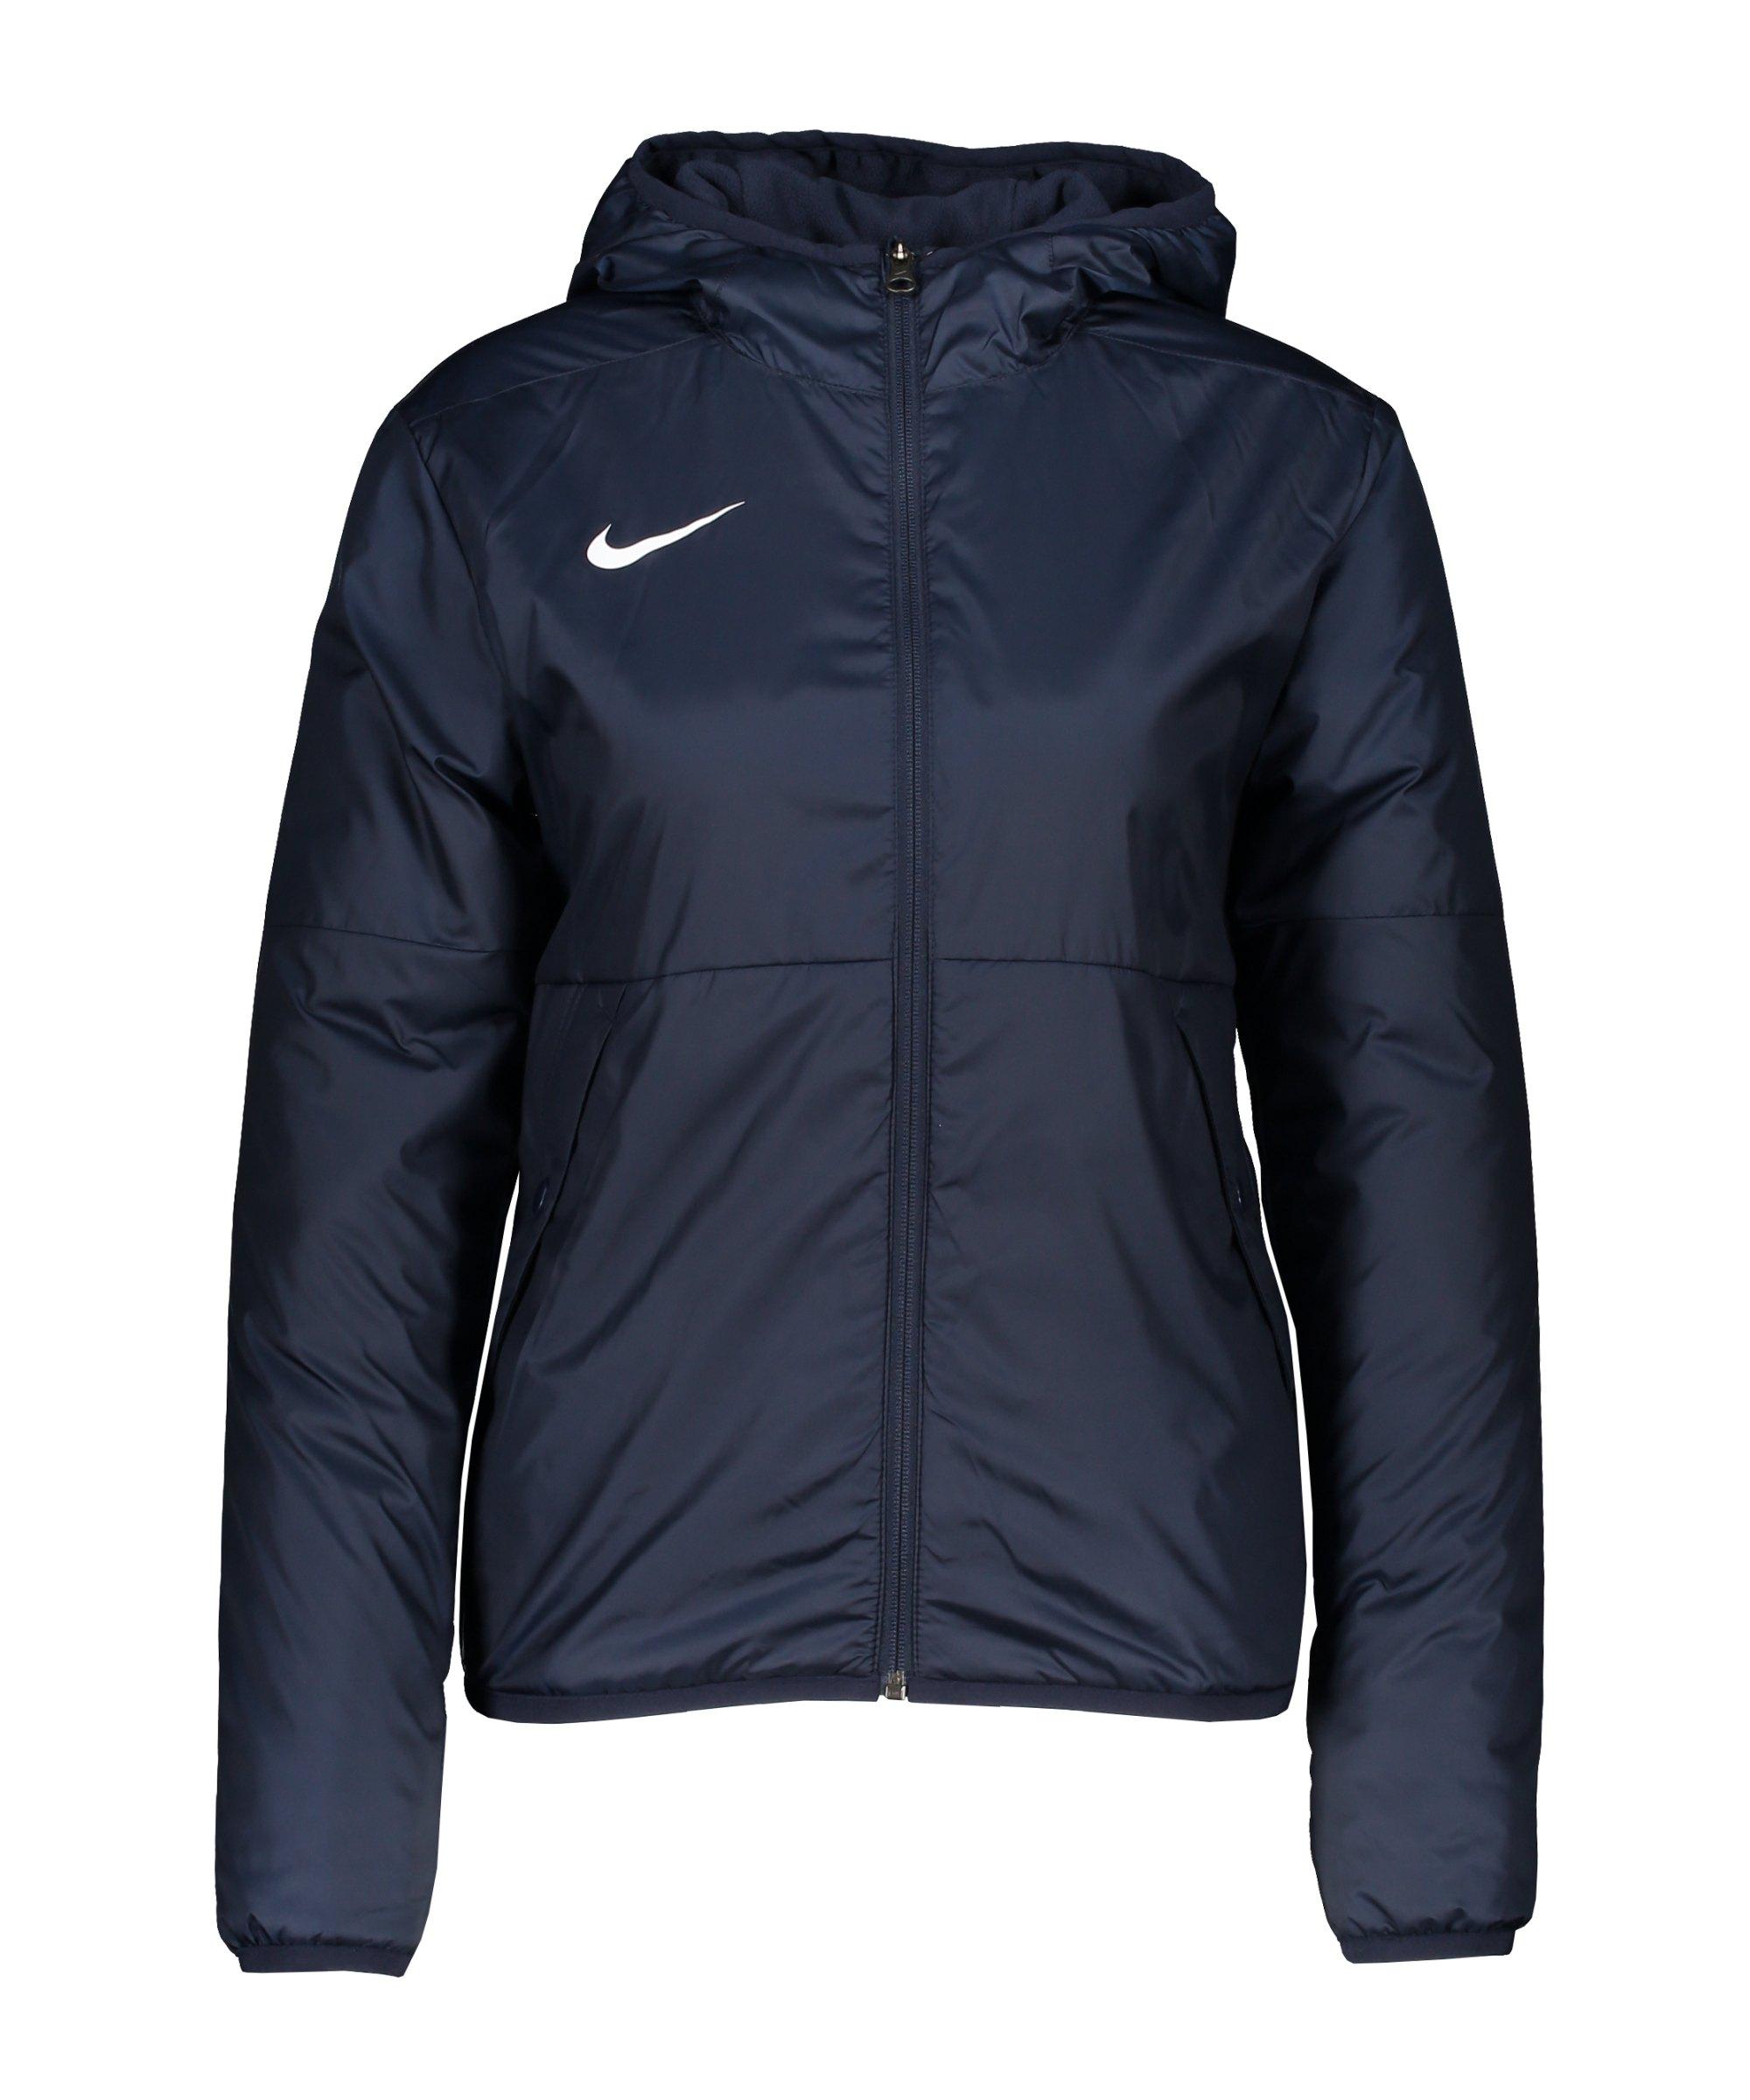 Nike Park 20 Repel Trainingsjacke Damen Blau F451 - blau